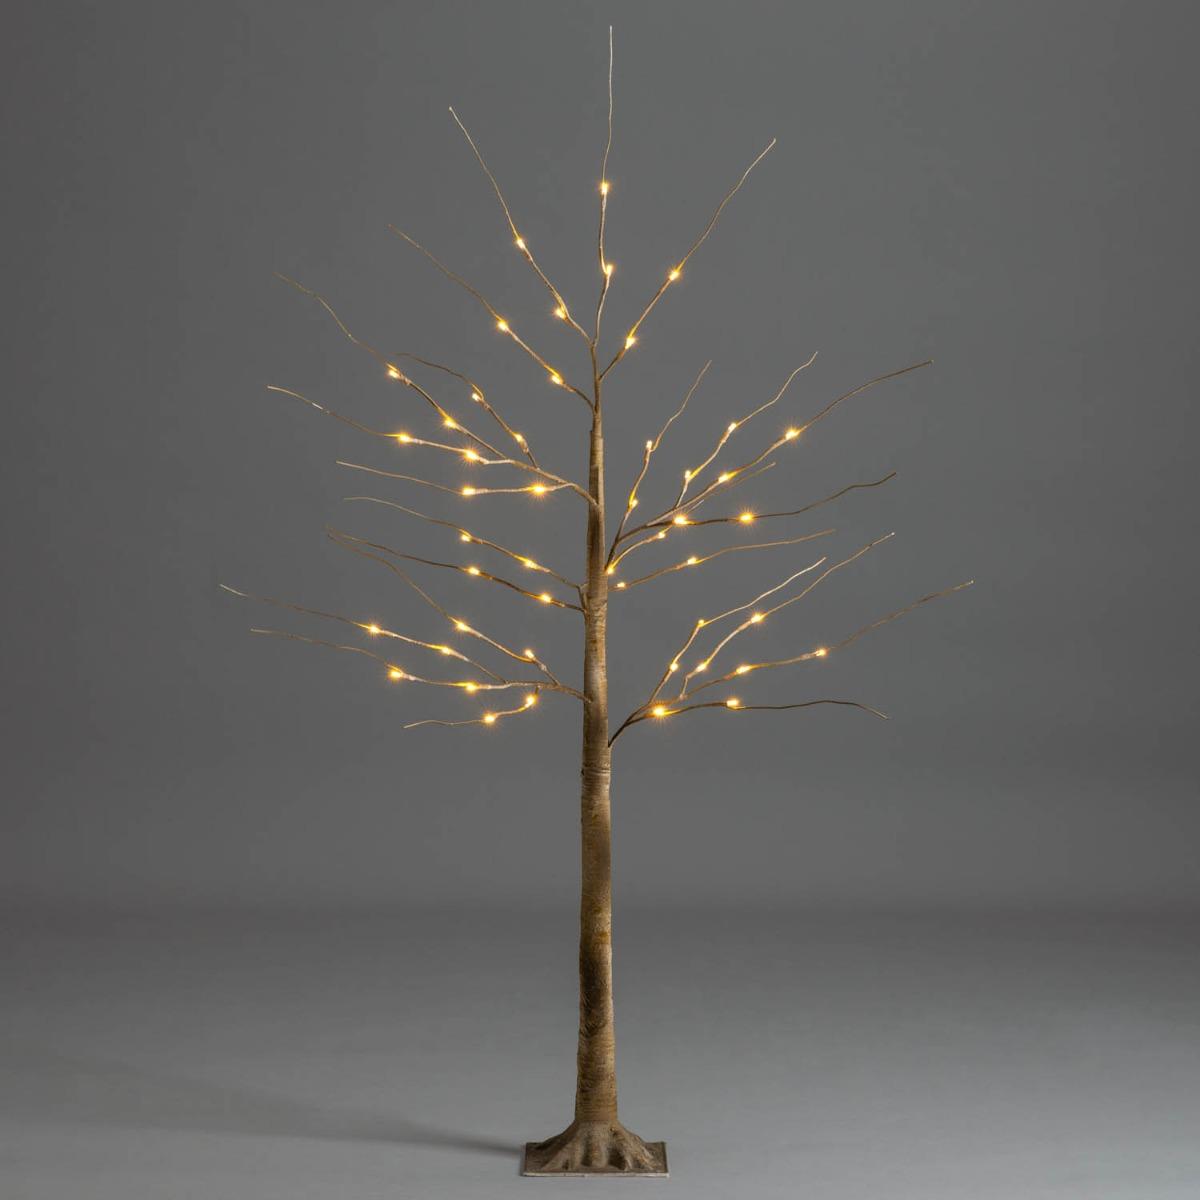 60cm Christmas Birch Tree Warm White Pre Lit Twig Light For Home Party DIY Decor